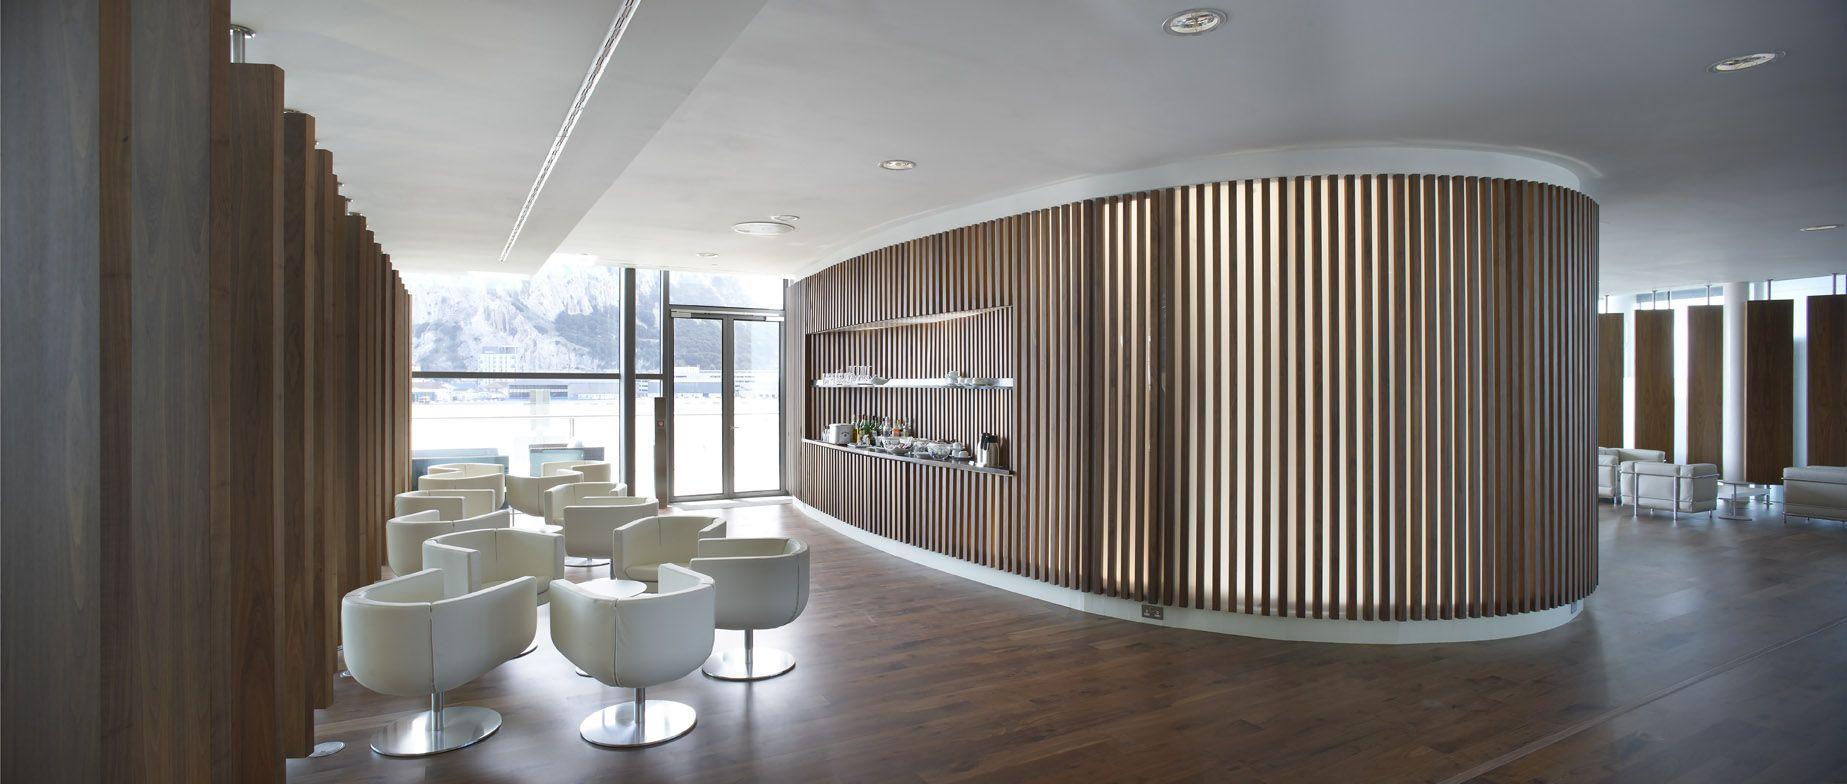 GIB - Gibraltar International Airport, business lounge | dan ...